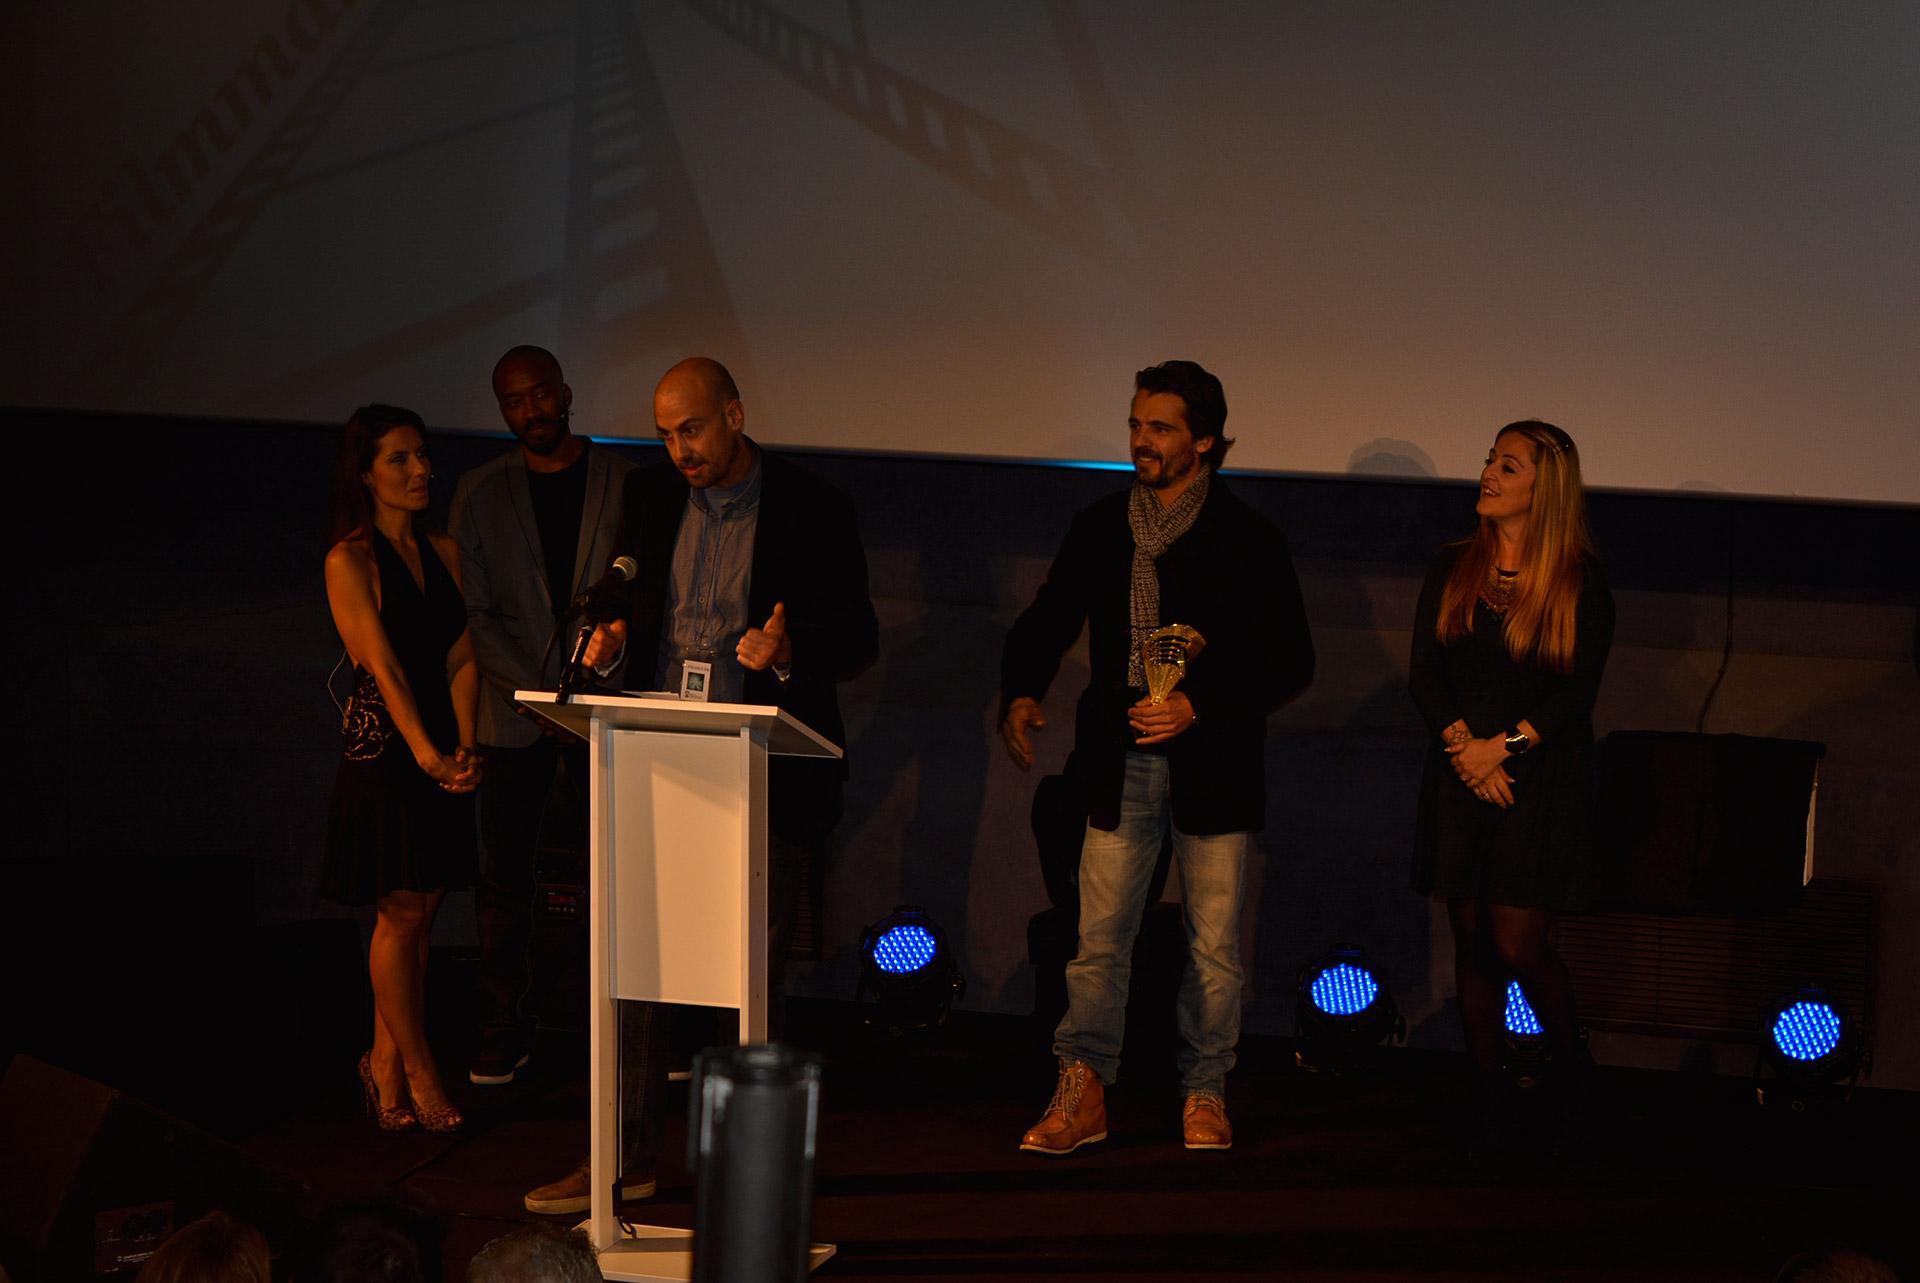 Ganadores retirando premios en el I Filmmaker International Film Festival - Cine Teatro Goya www.arianasoffici.com